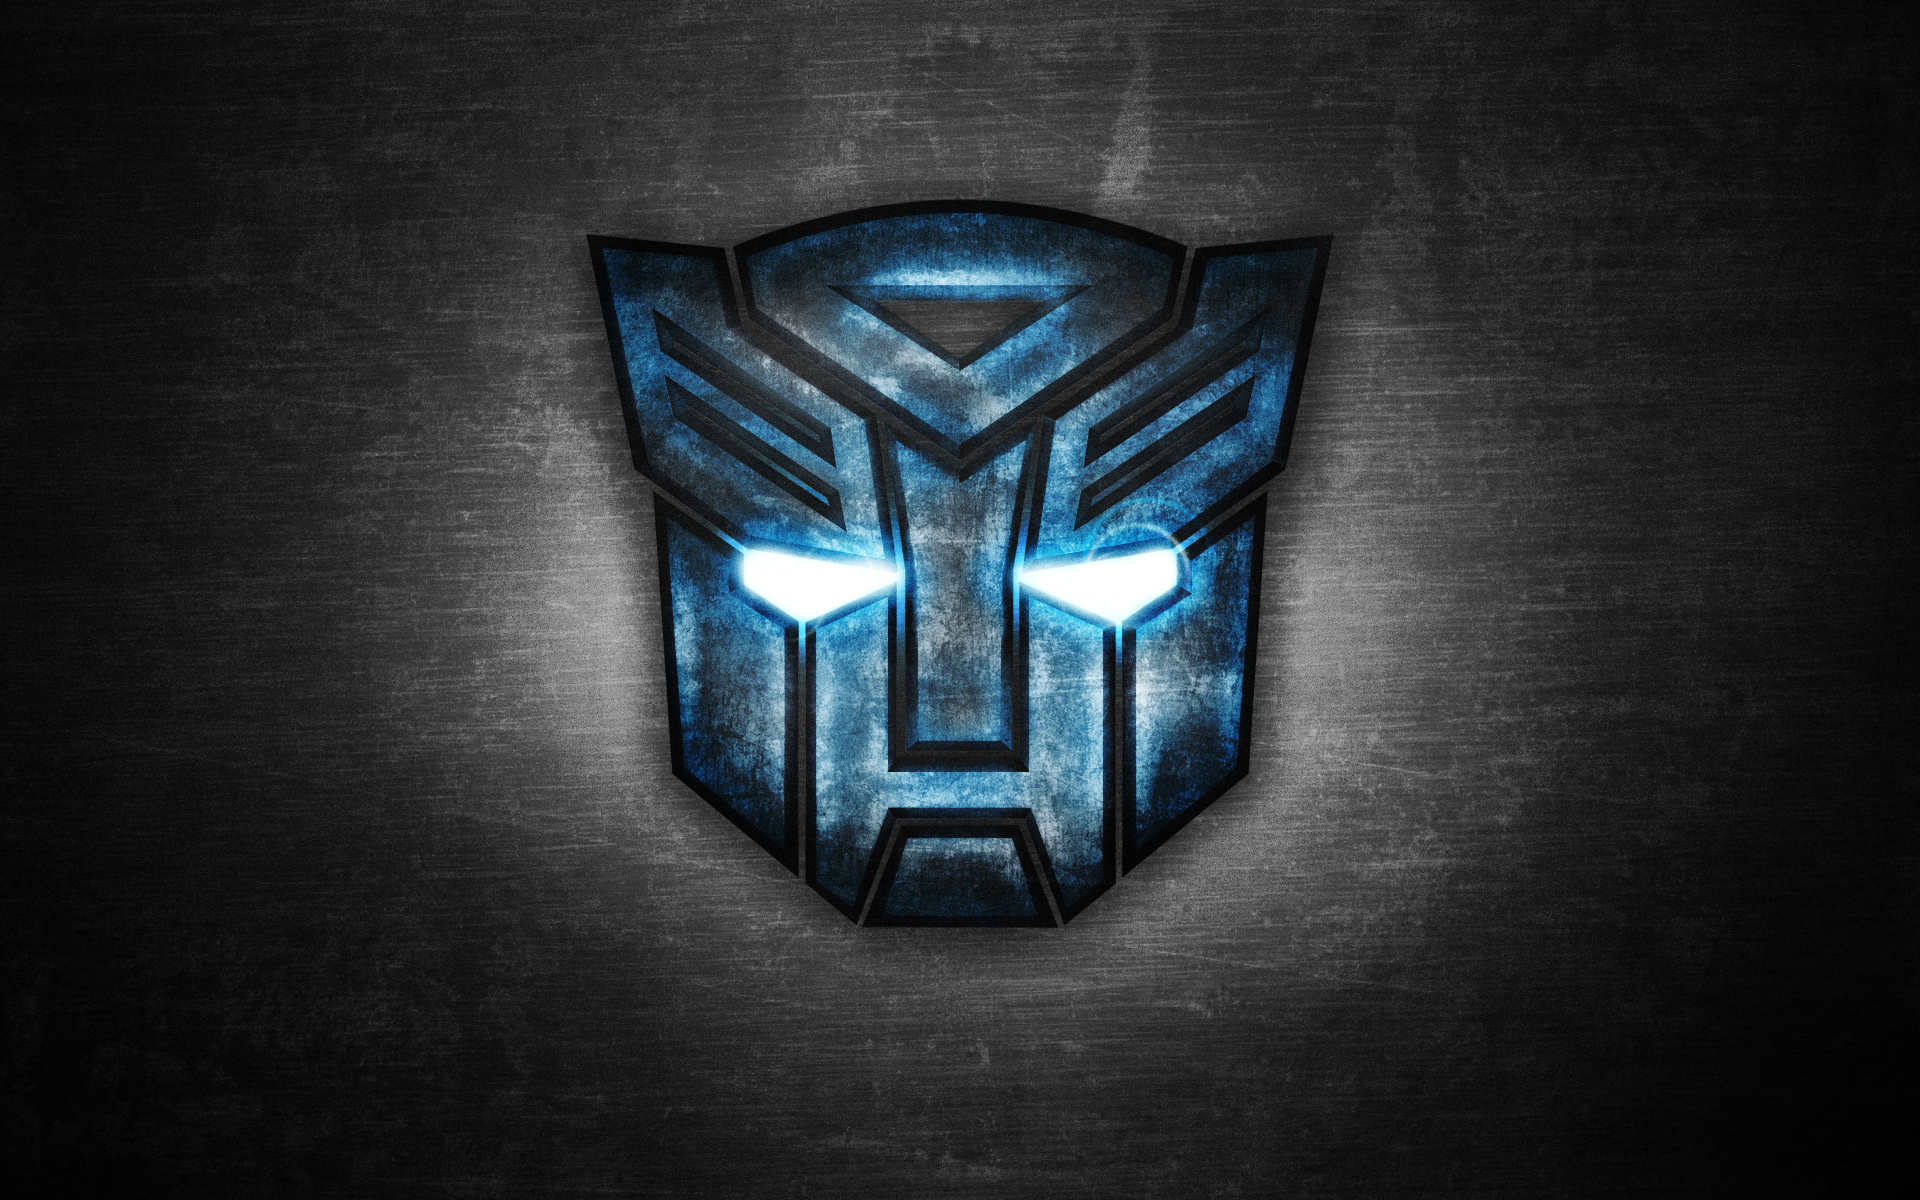 Transformers wallpaper 1920x1200 3   hebusorg   High Definition 1920x1200